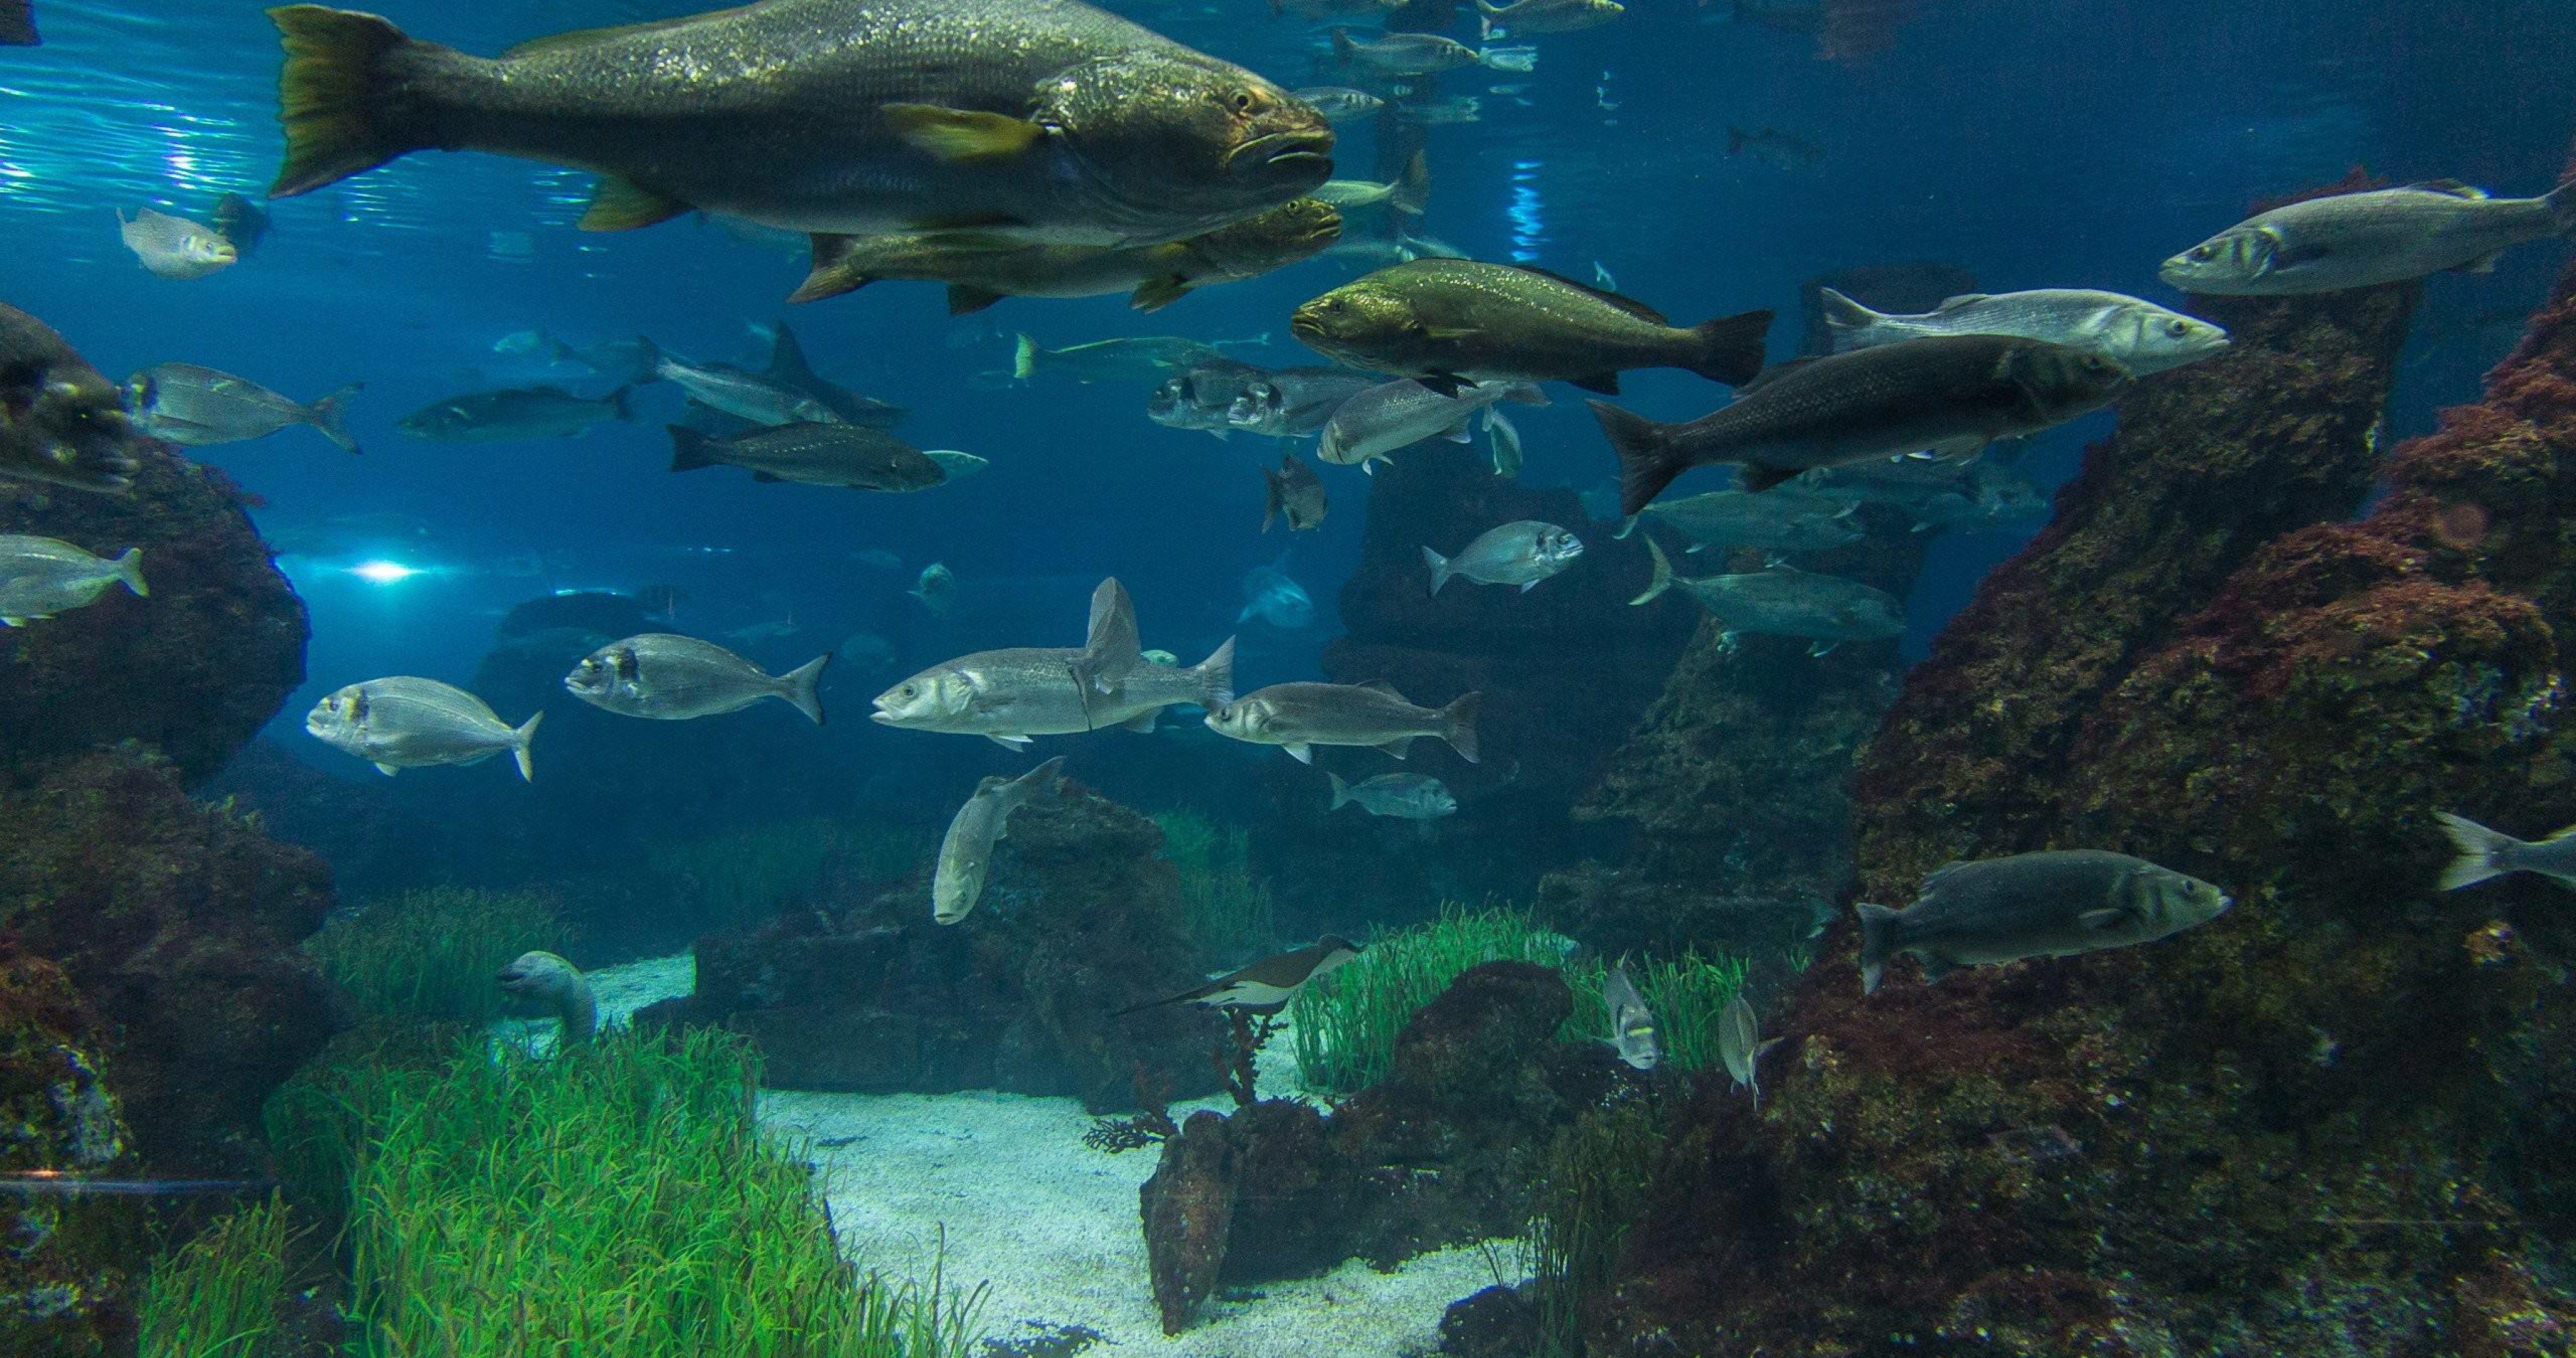 4k Ultra Hd Fish Wallpapers Top Free 4k Ultra Hd Fish Backgrounds